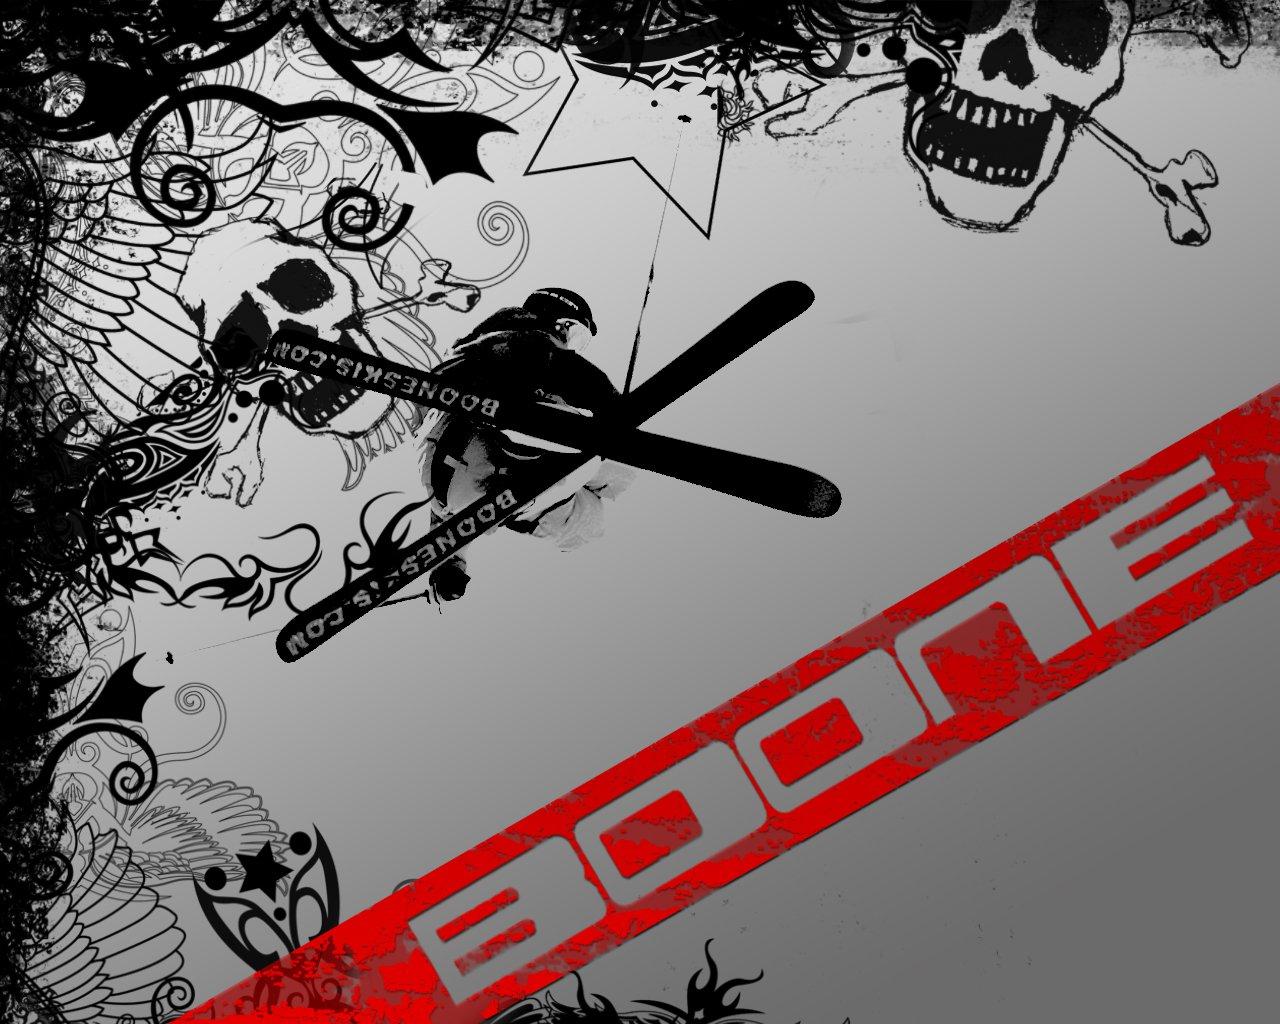 BOONE Skis - Superfreak wallpaper